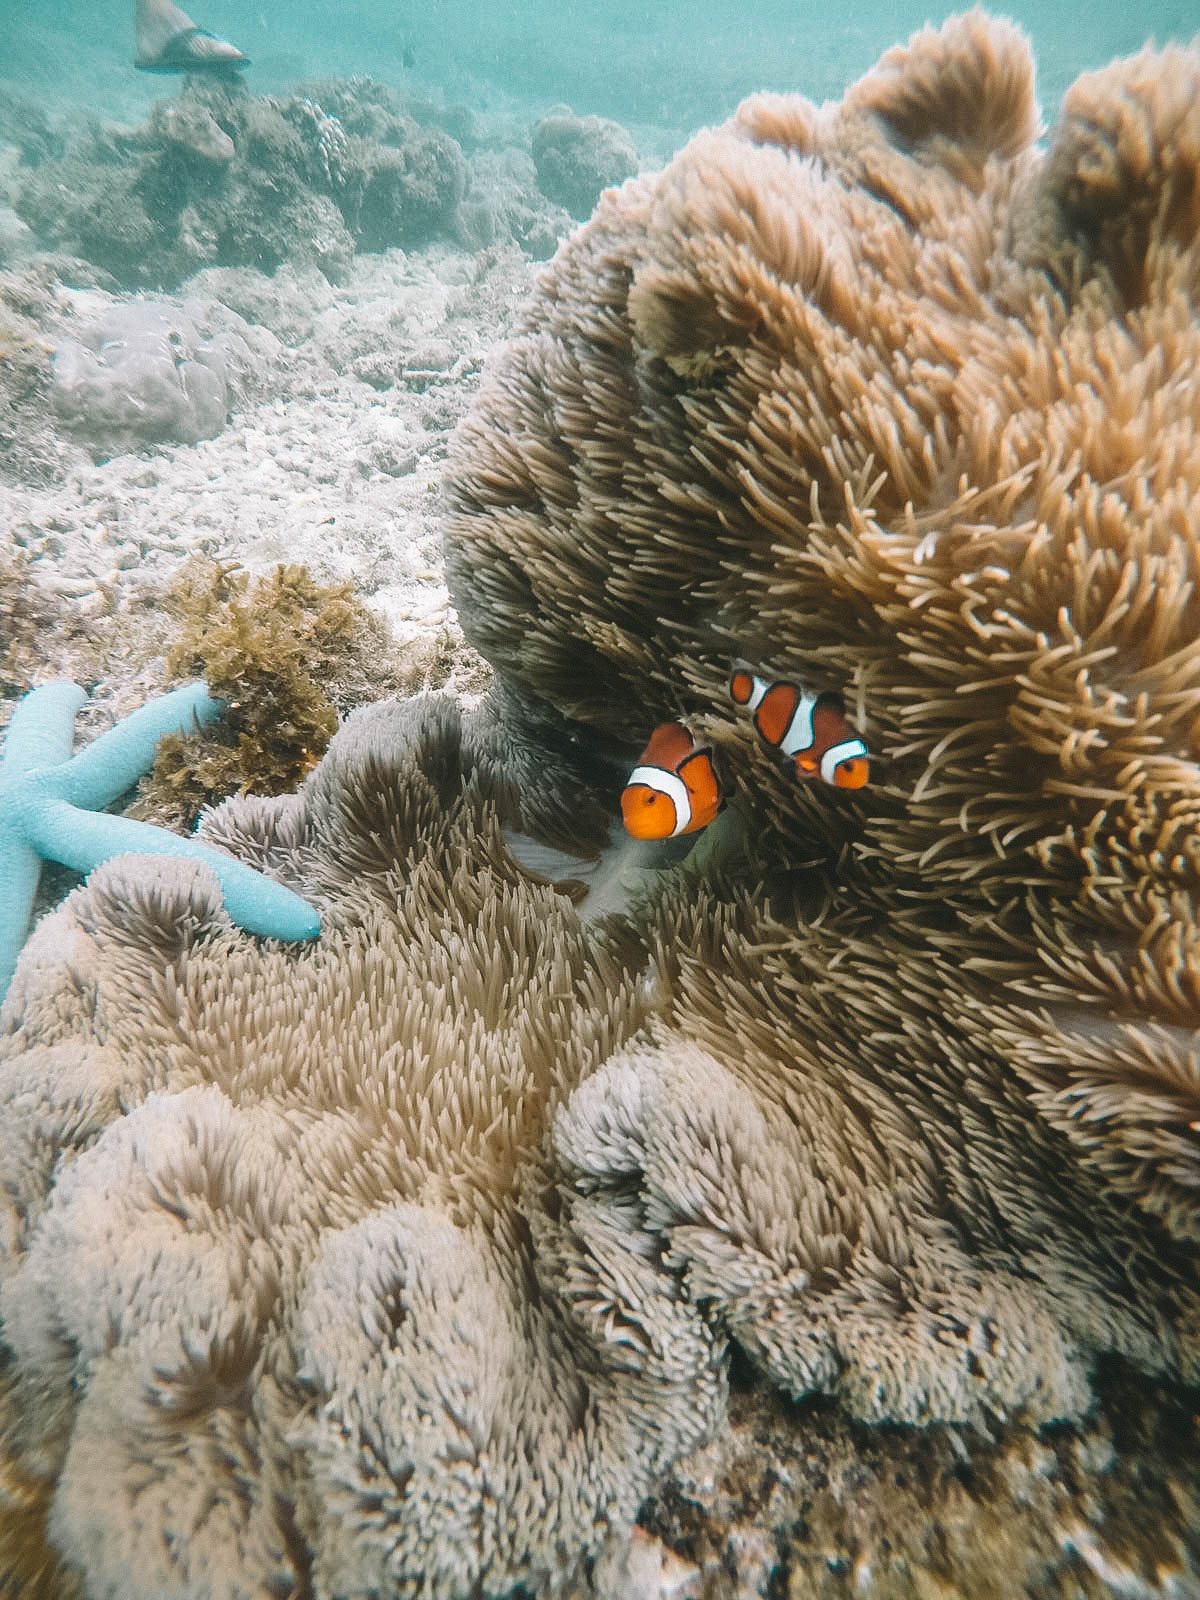 Snorkeling Apo Island - Blondie Baby blog mode Paris et voyages